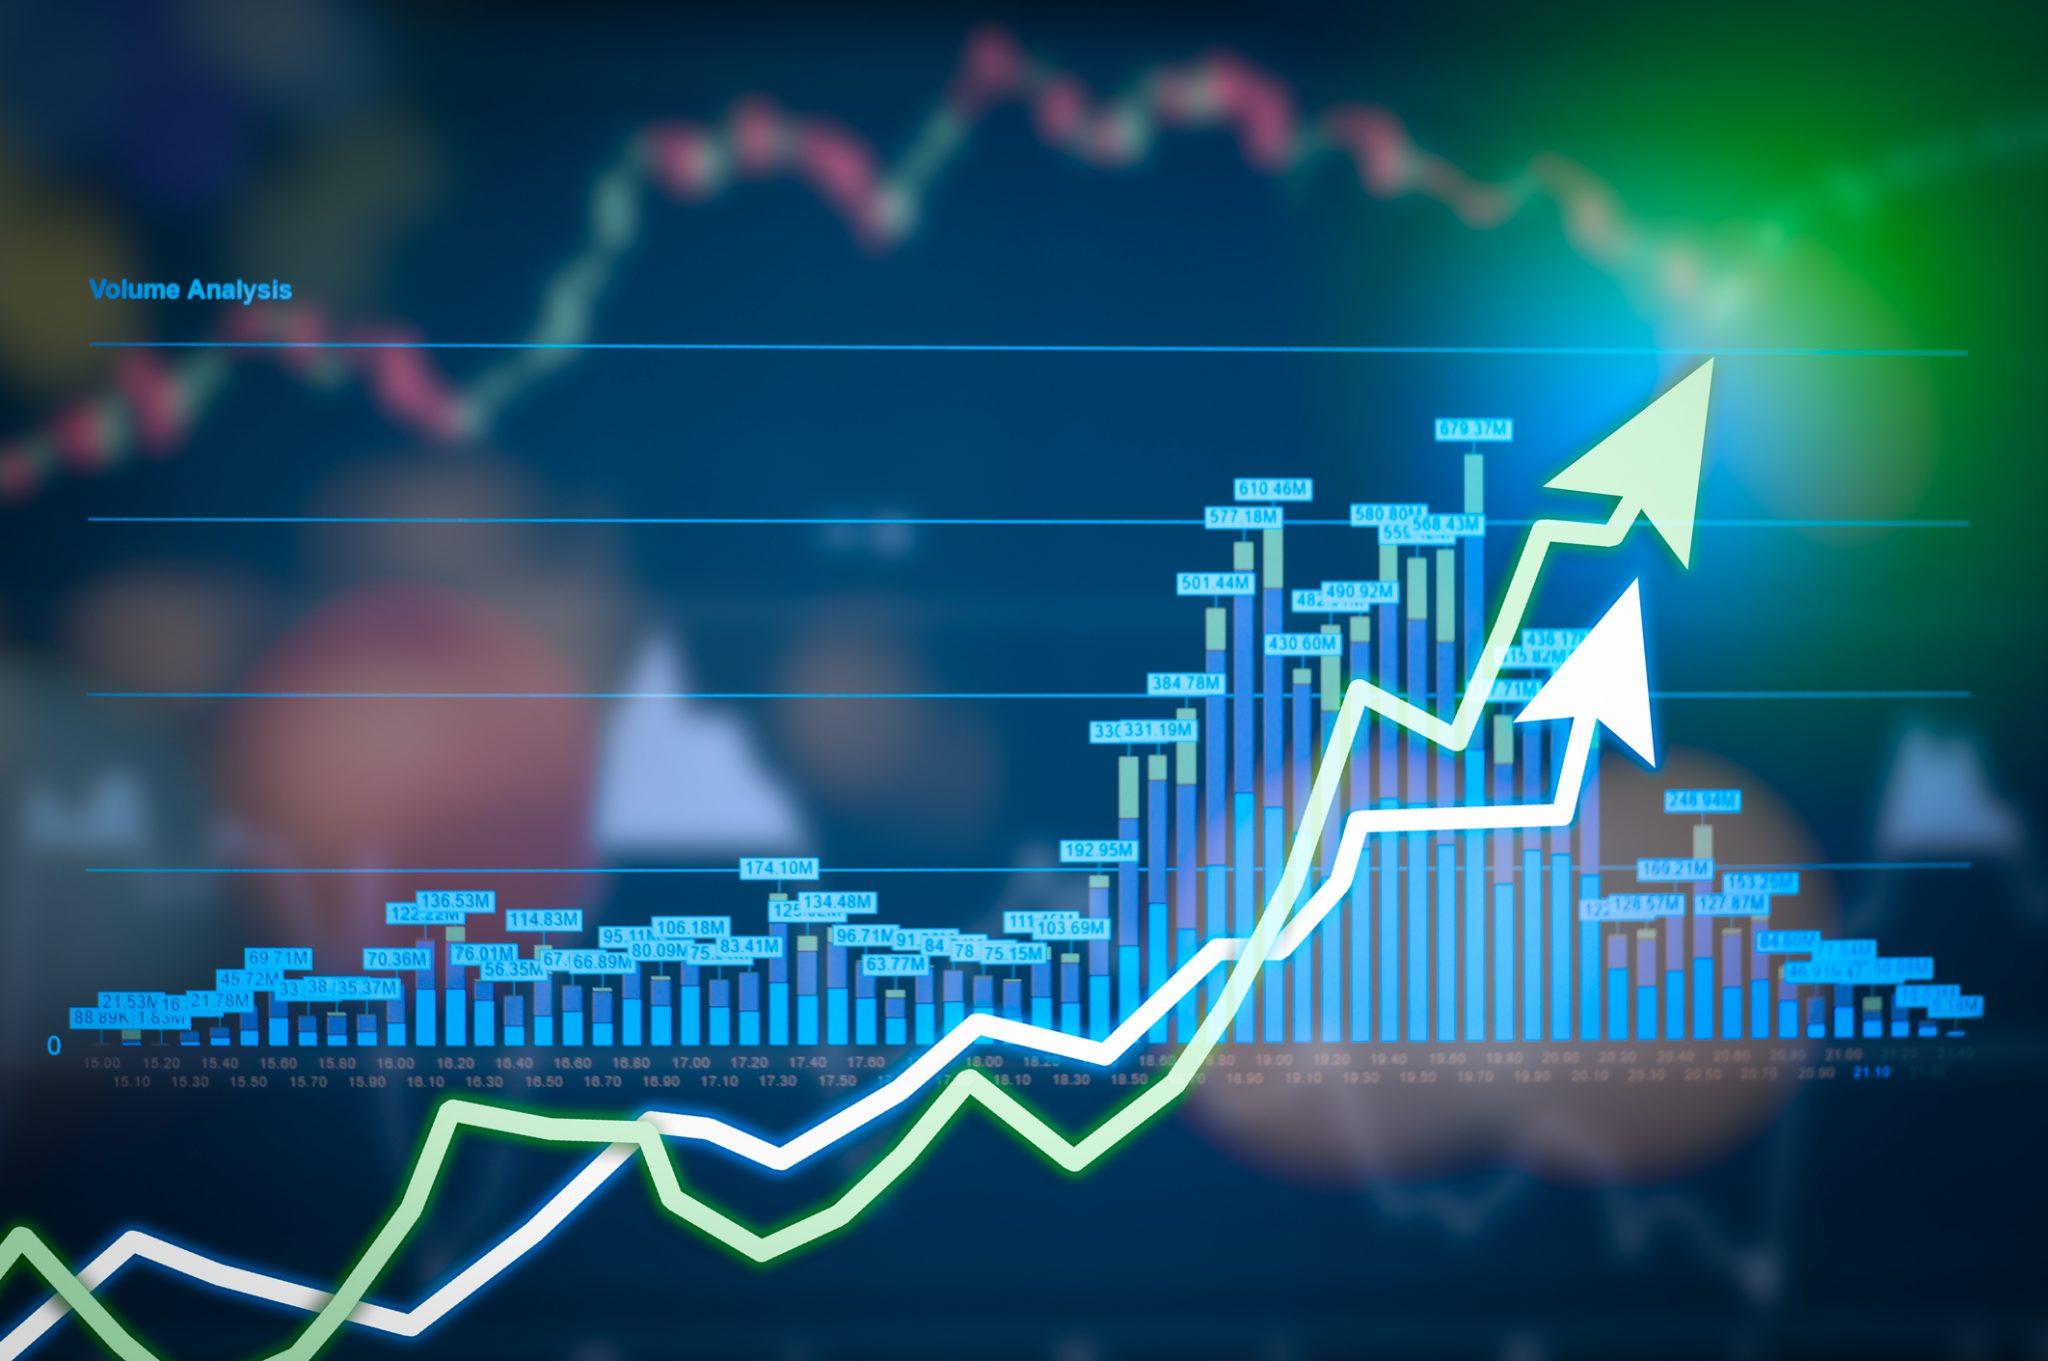 Top 56 High Yield Bonds